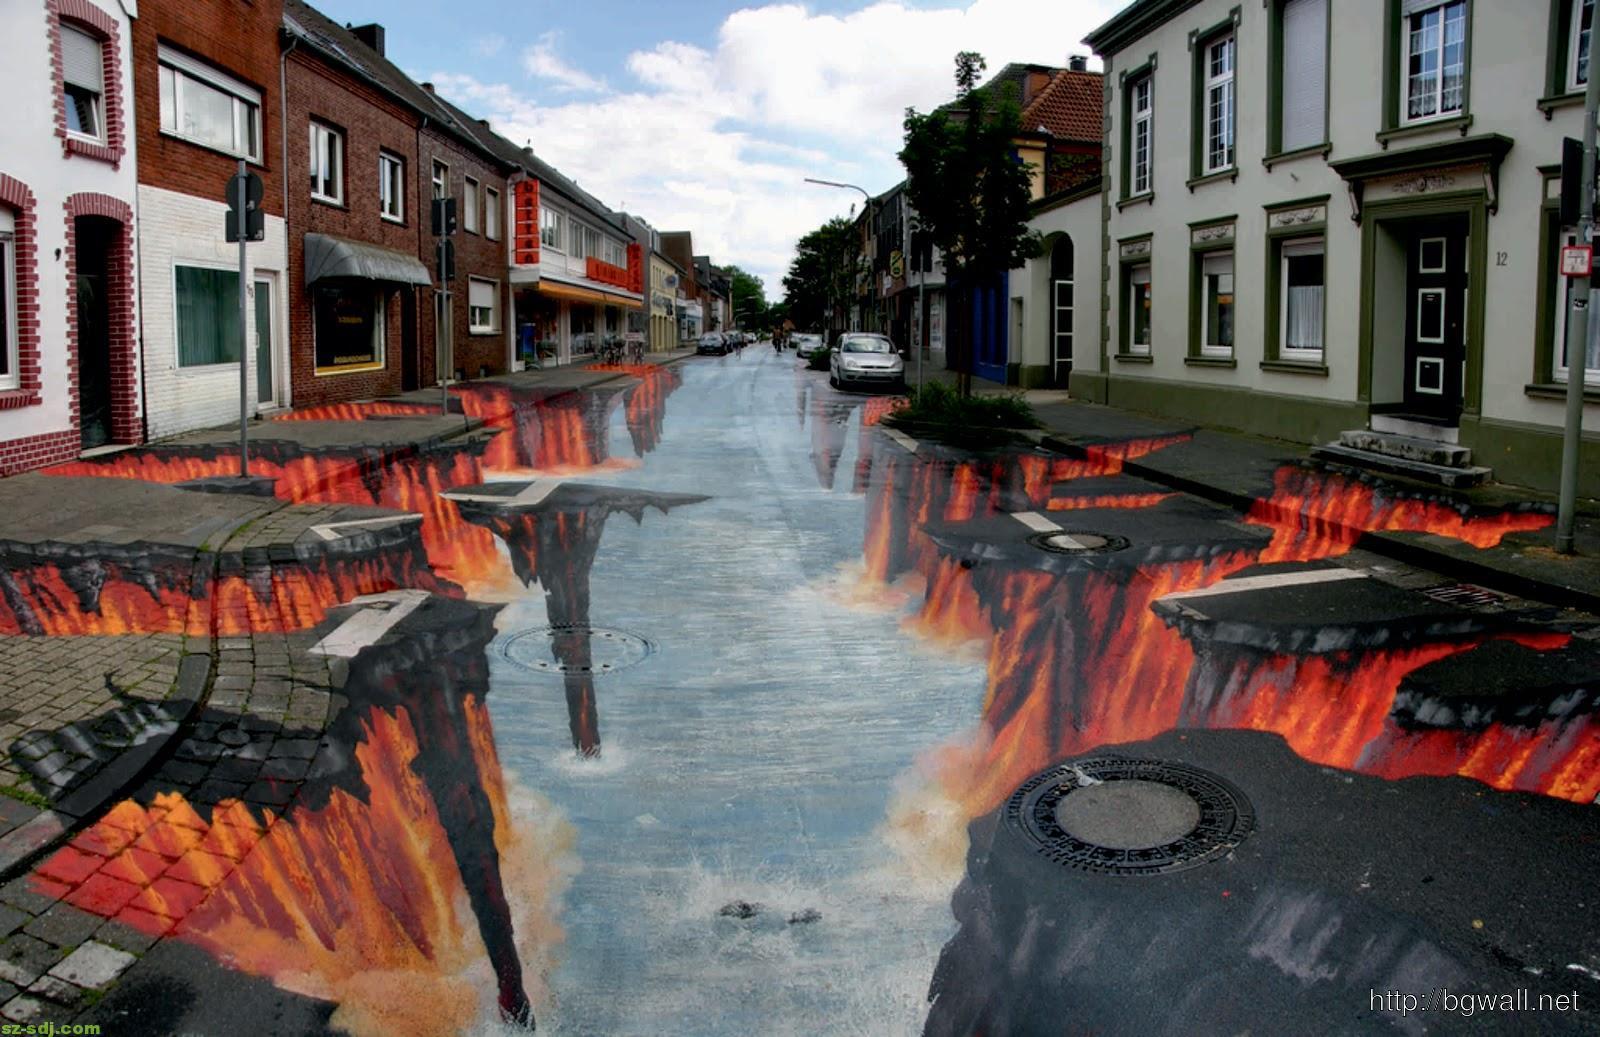 art-street-along-the-way-wallpaper-image